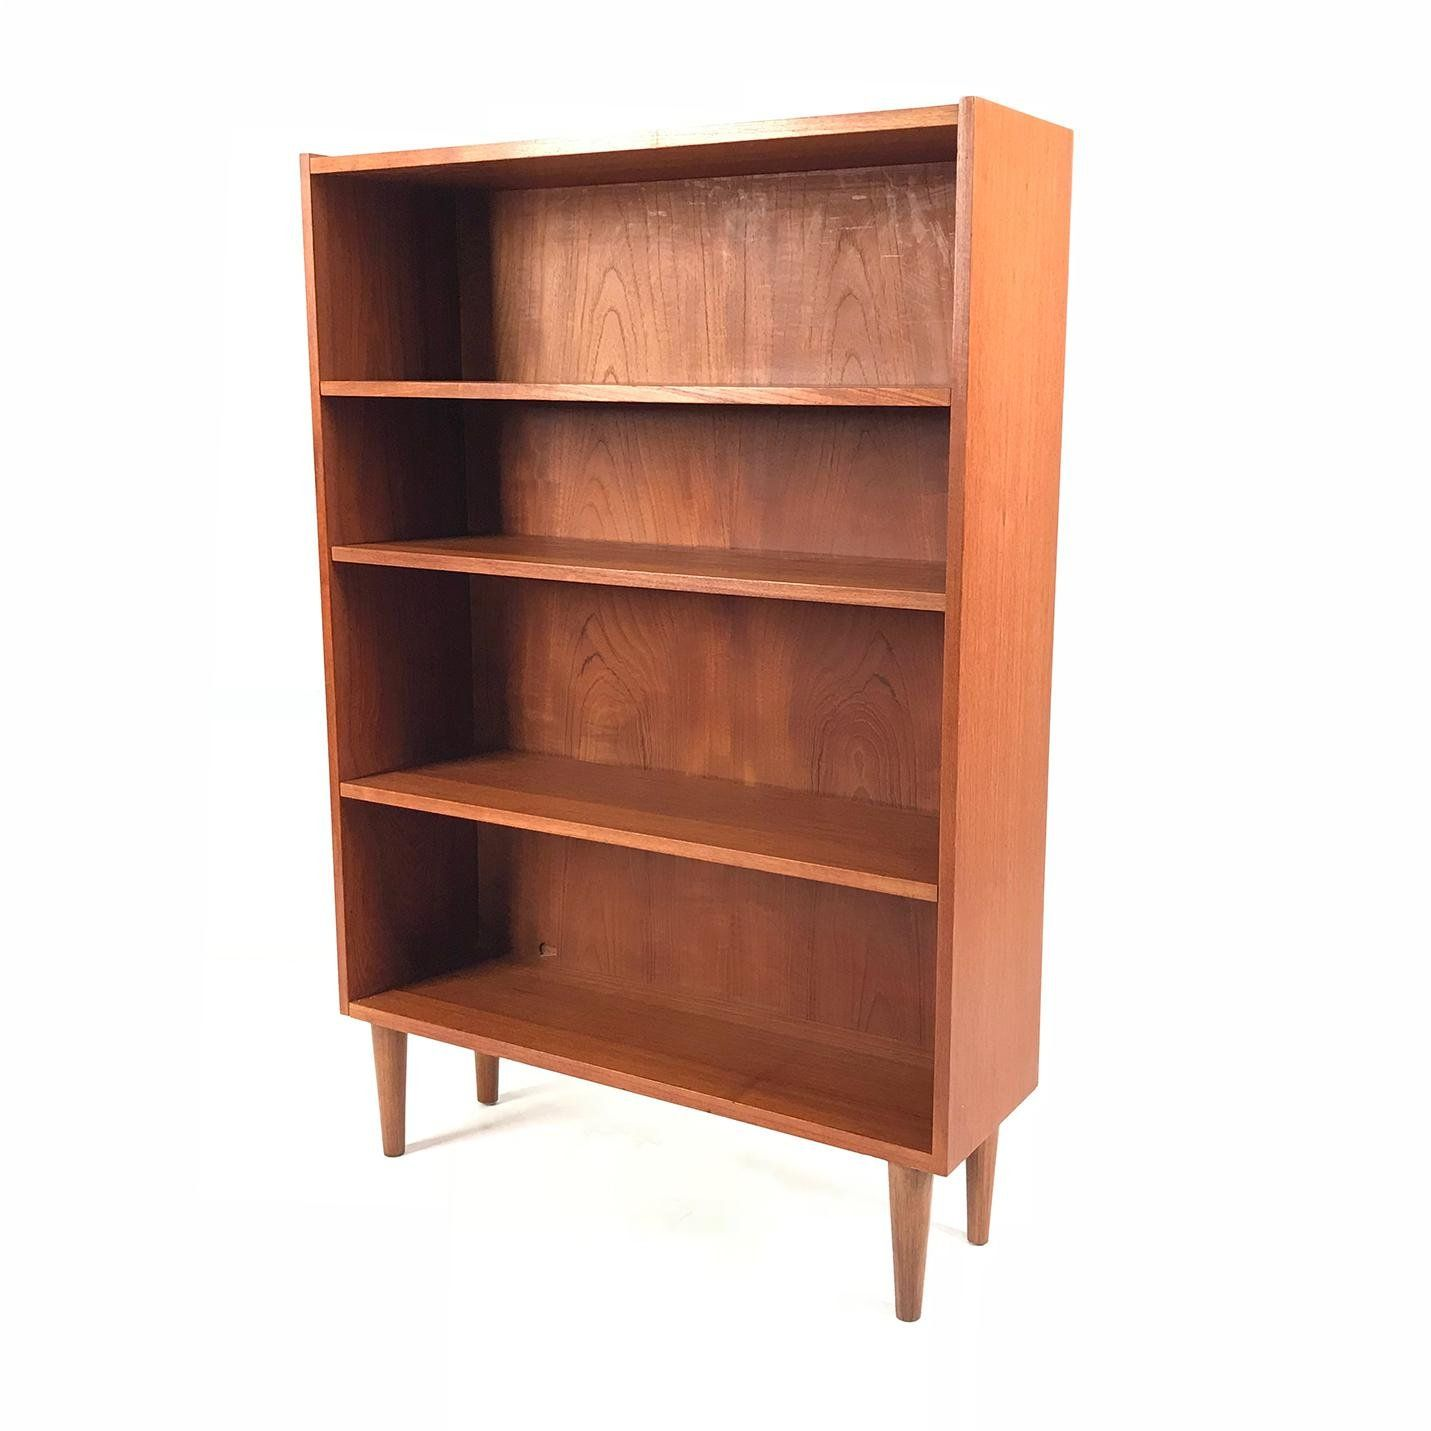 Vintage Danish Teak Bookcase For Sale Image 4 Of 4 Retro